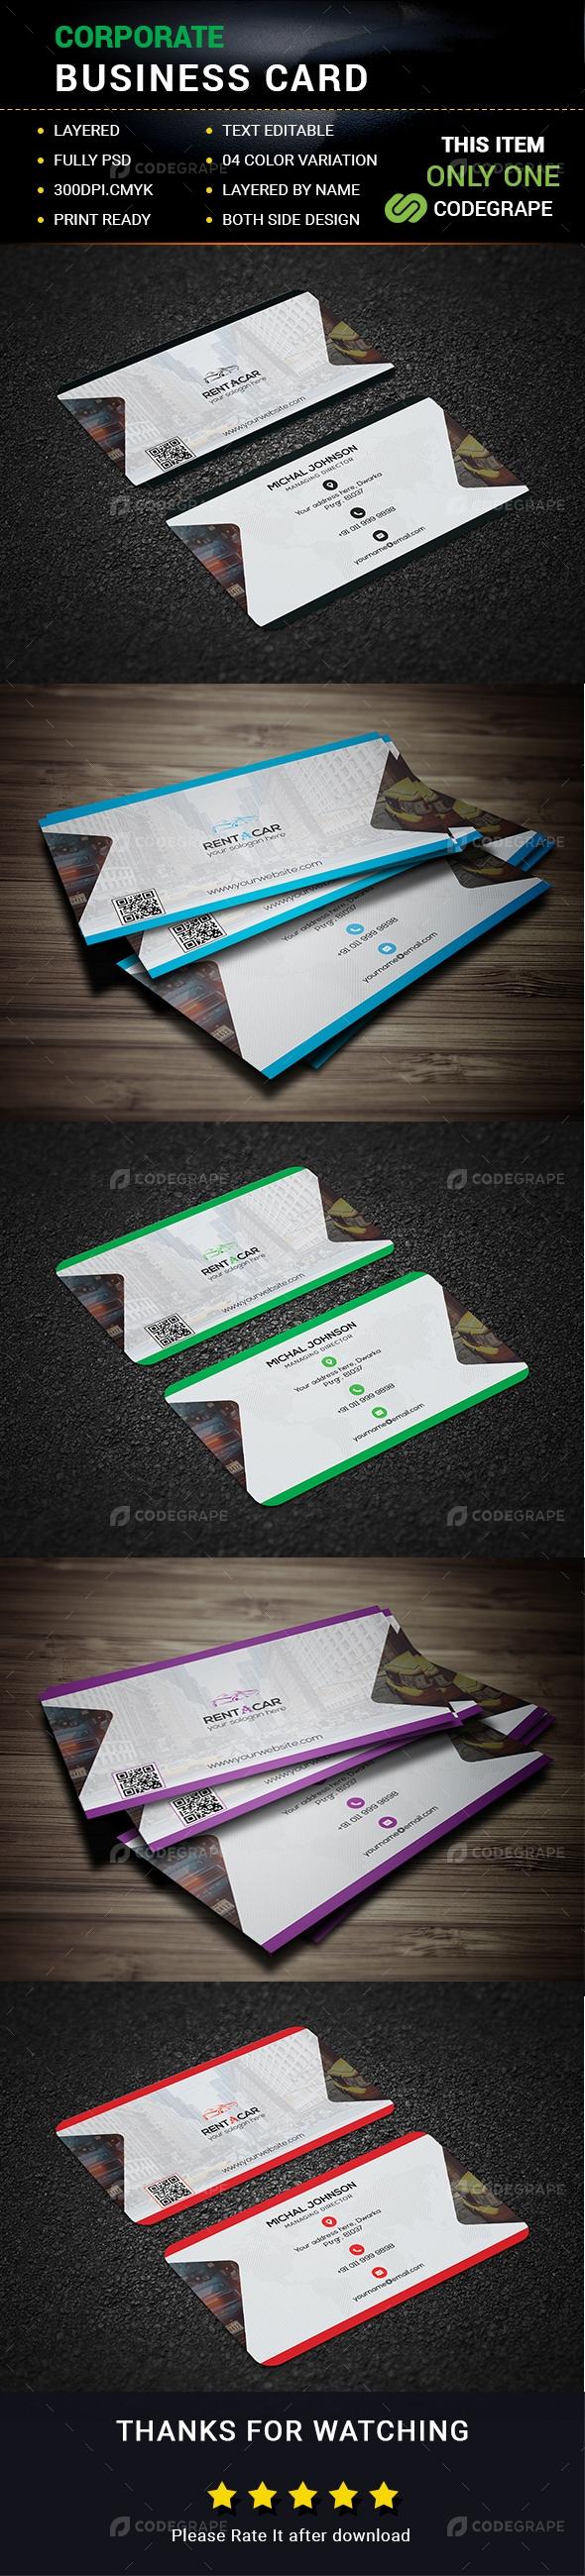 Corporate Business Card 02